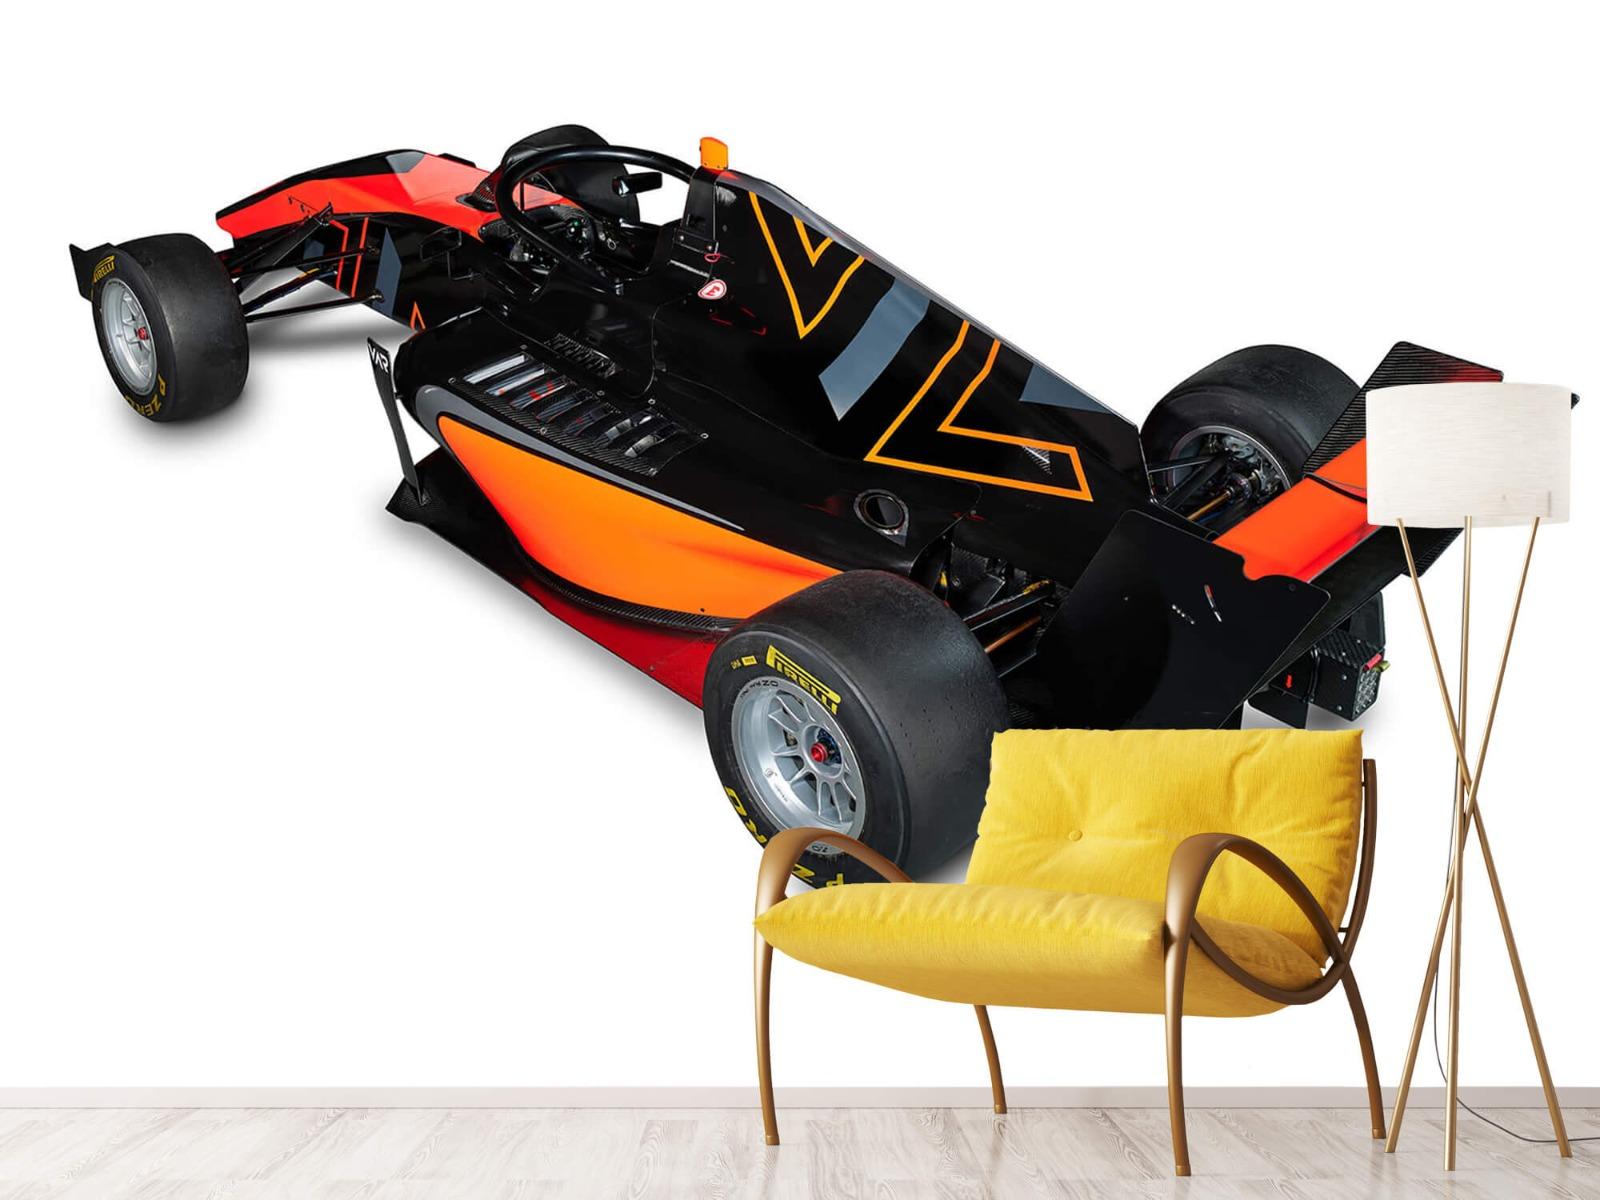 Sportauto's - Formula 3 - Rear left view - Hobbykamer 1